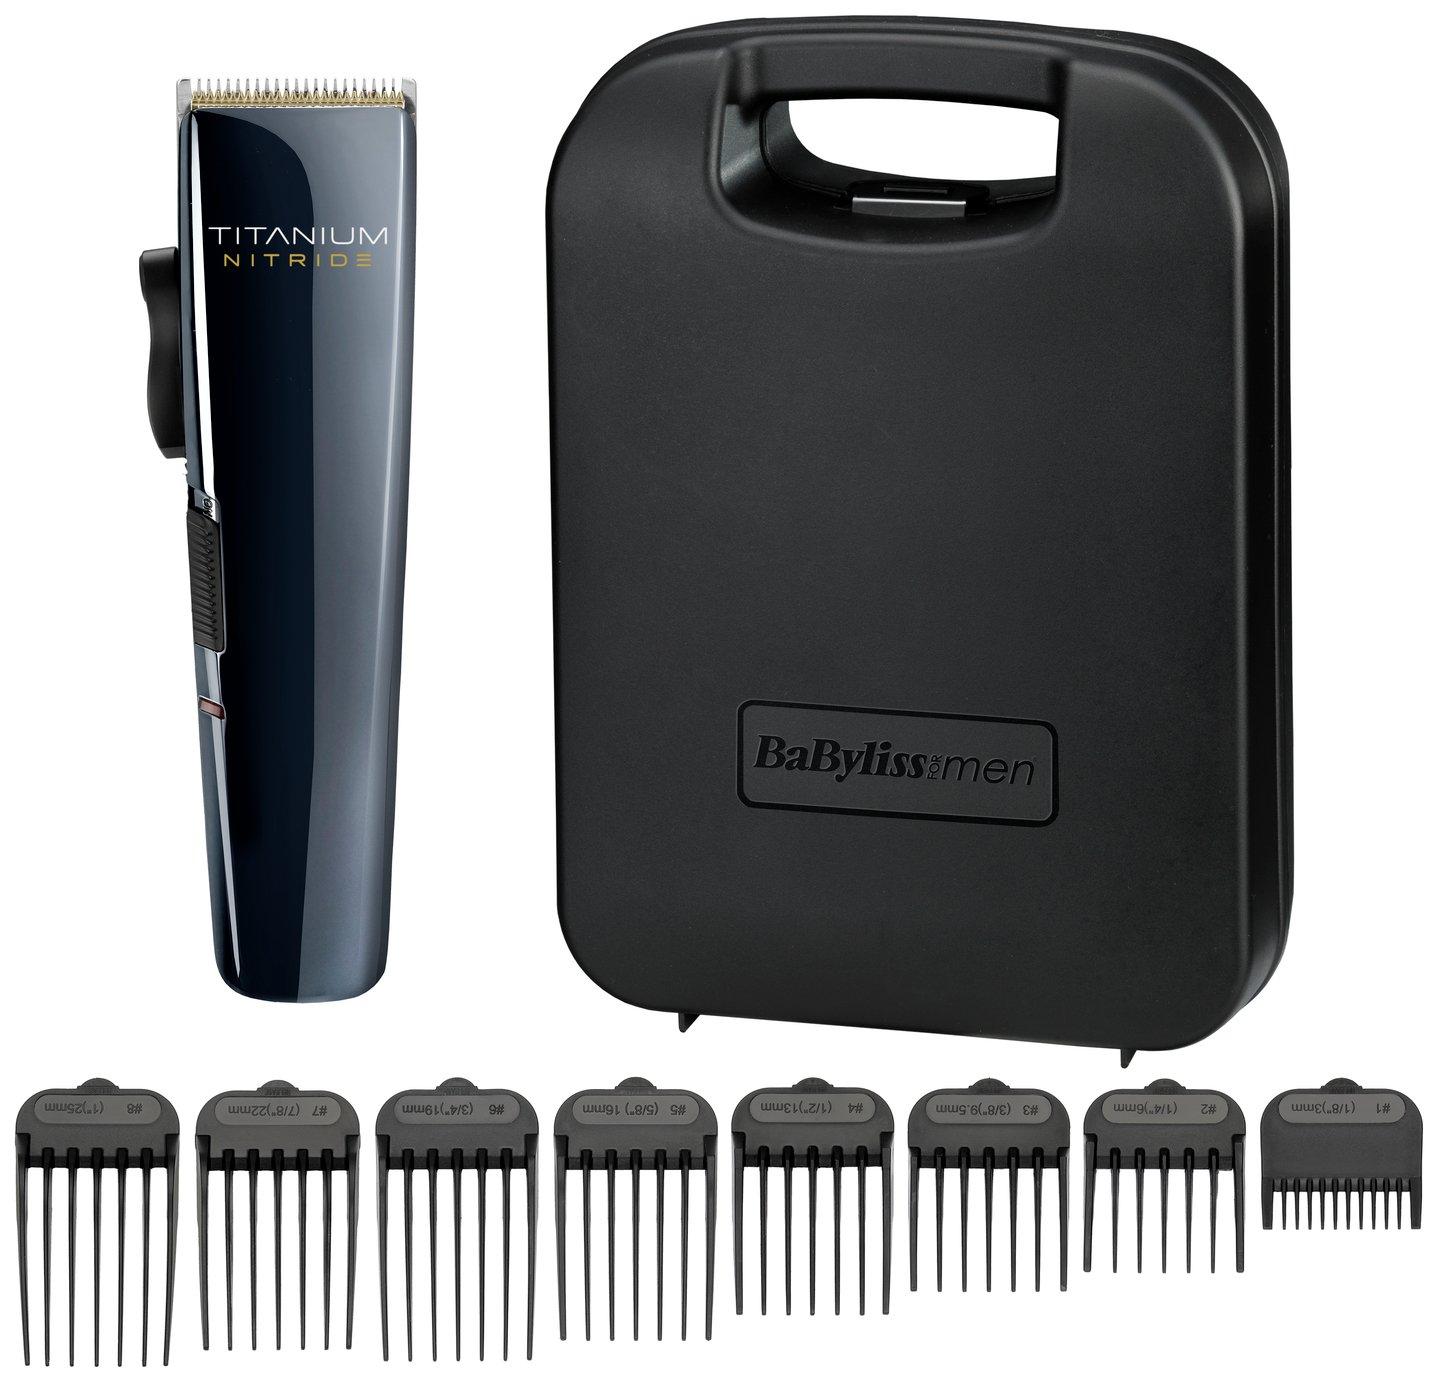 BaByliss For Men Titanium Nitride Hair Clipper 7471U